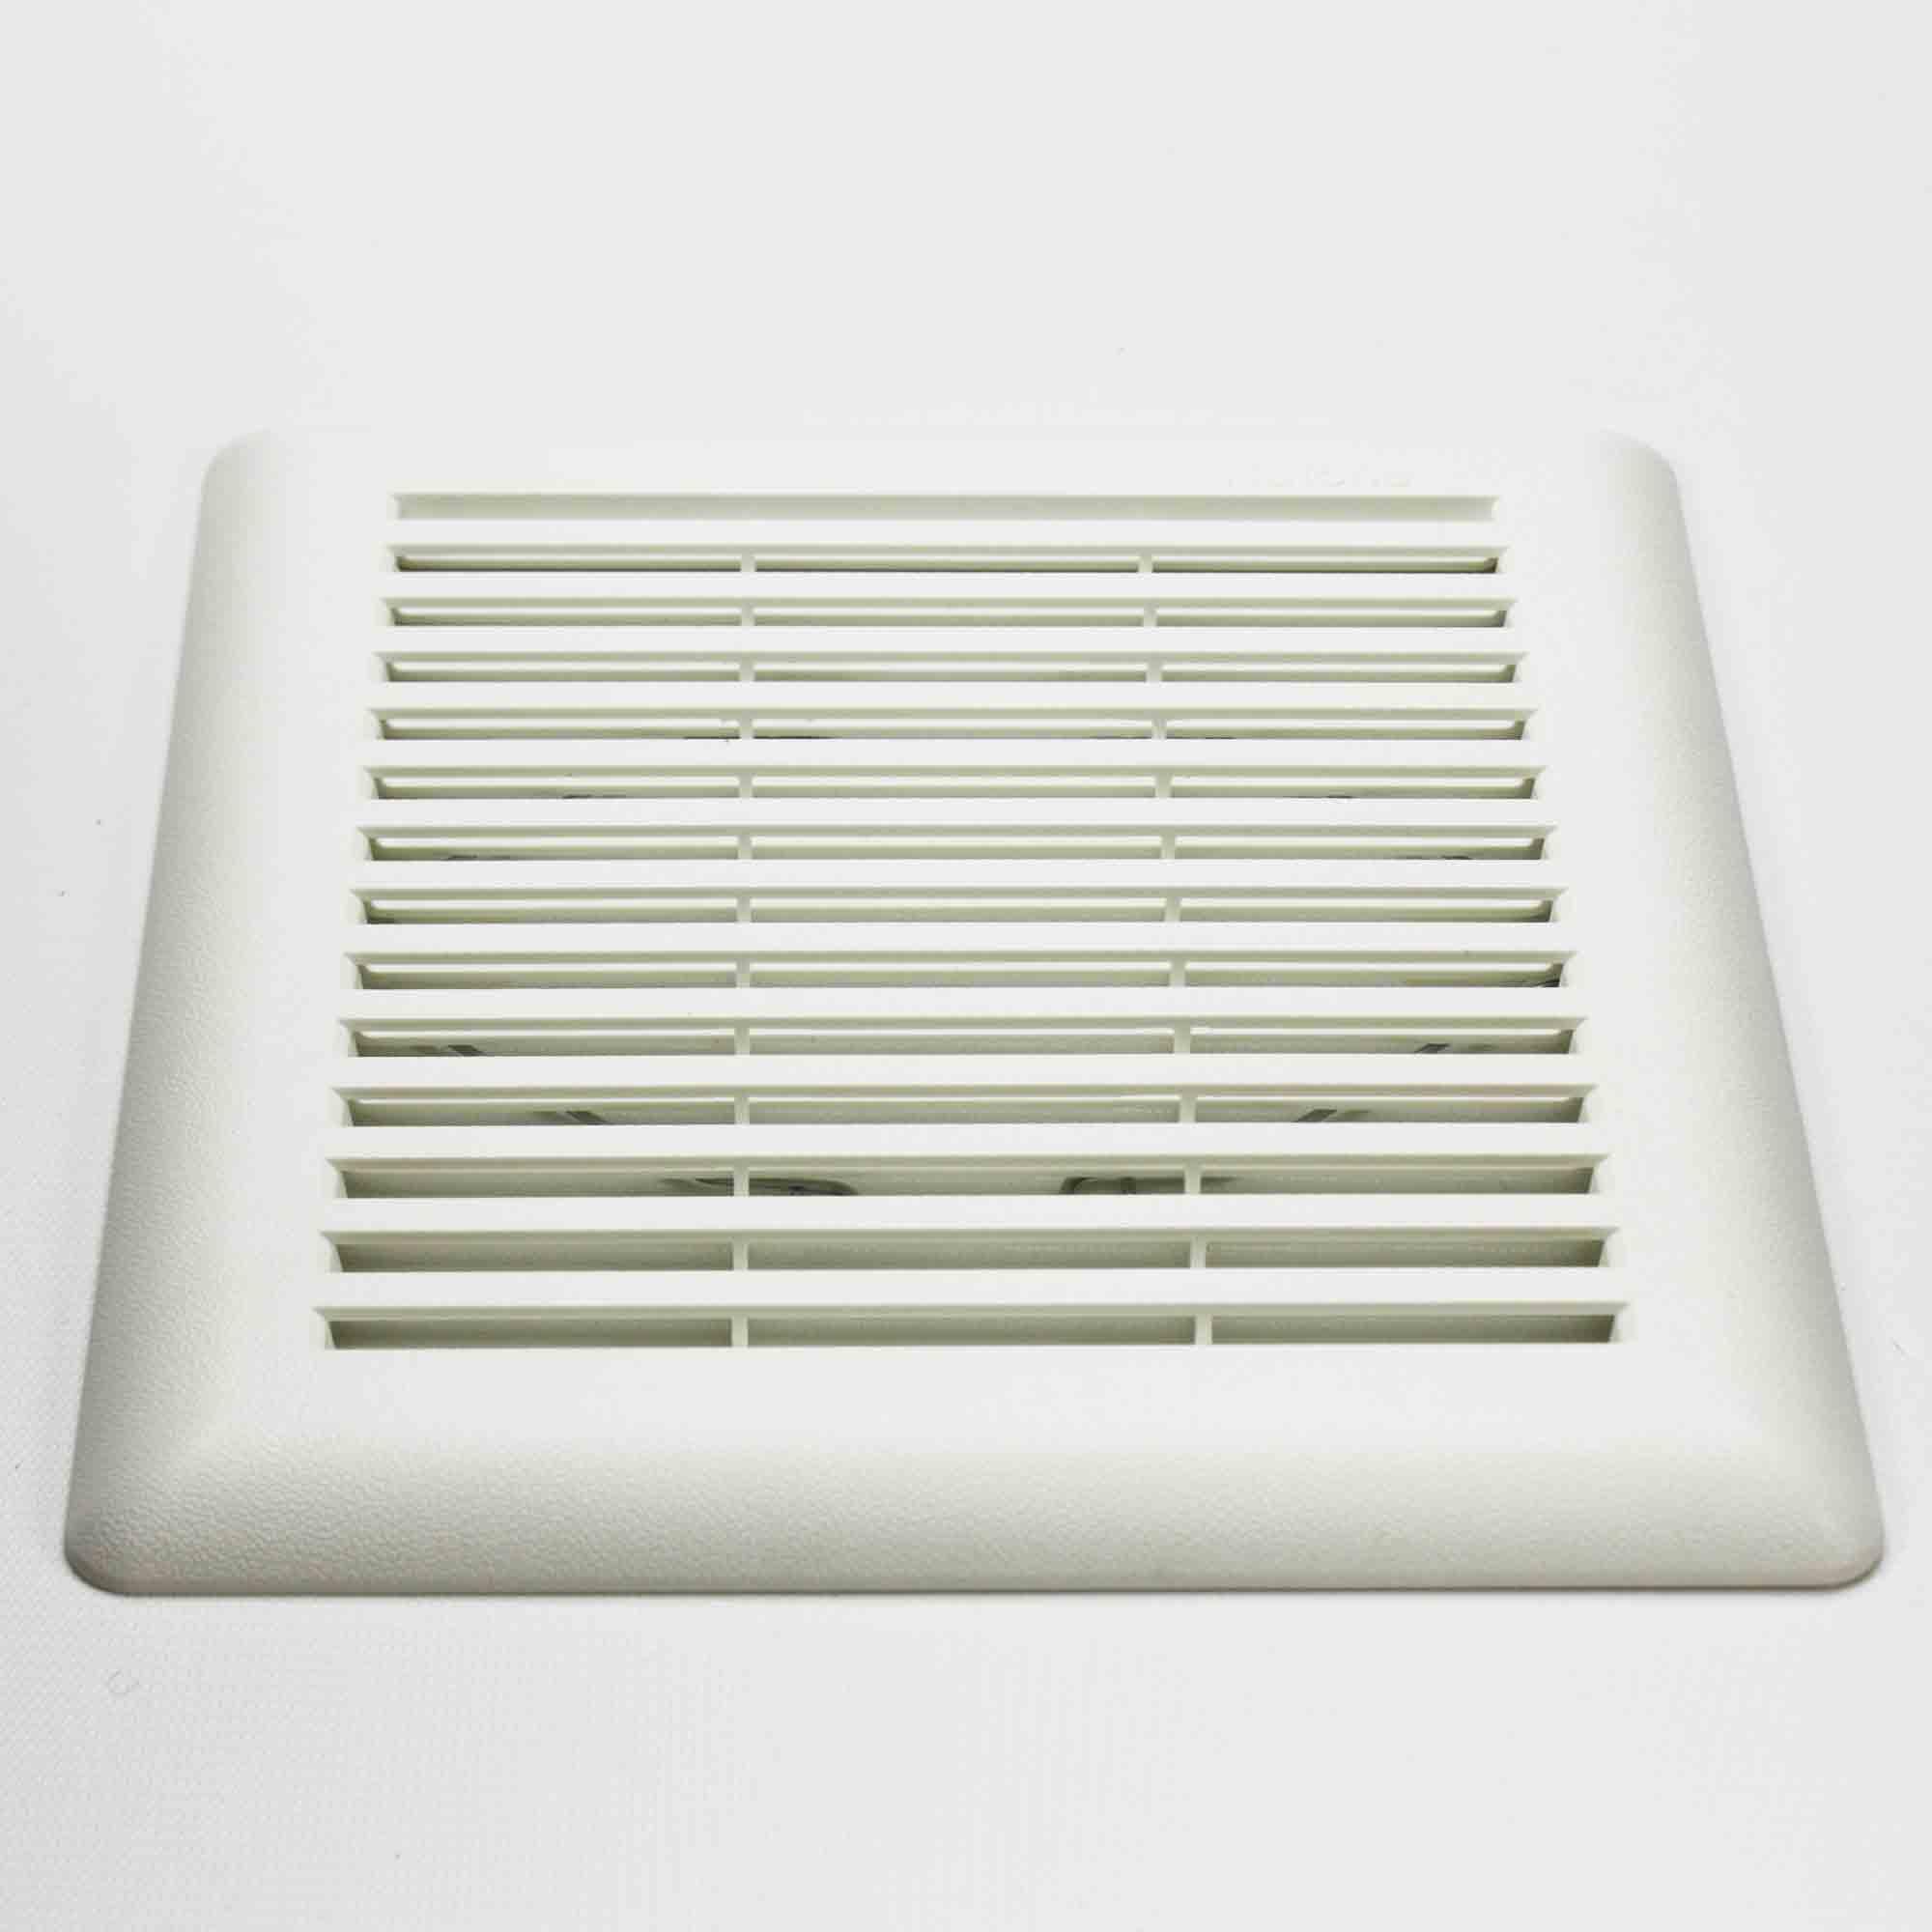 s97017068 for broan bathroom exhaust fan vent grille ebay